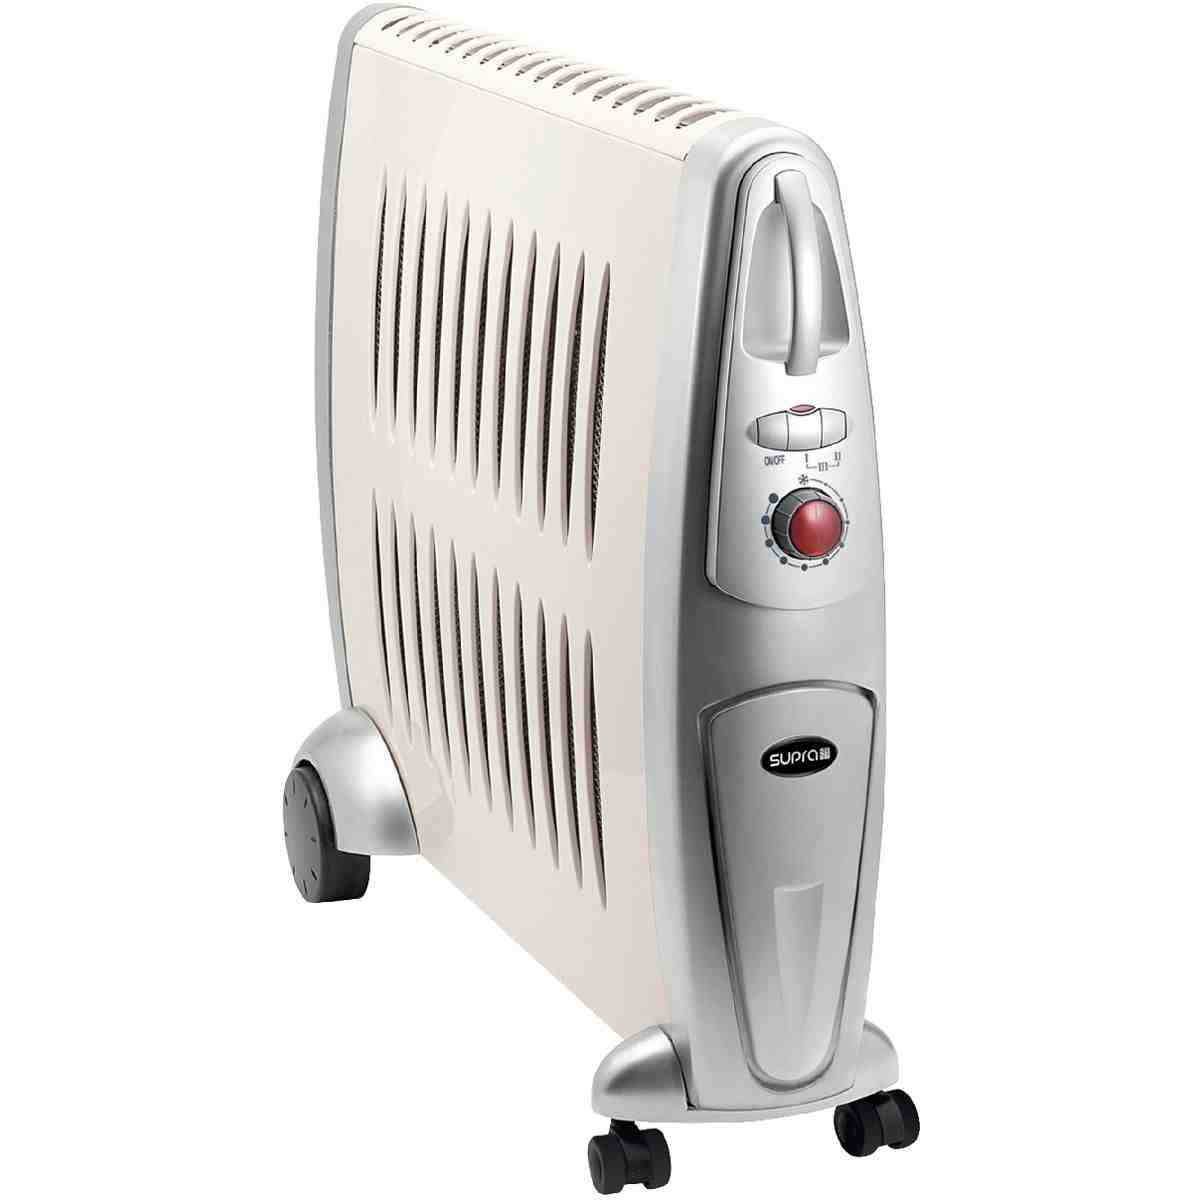 Radiateur mobile chaleur douce c ramino supra 1500 w de radiateur chaleur douce - Radiateur chaleur douce ...